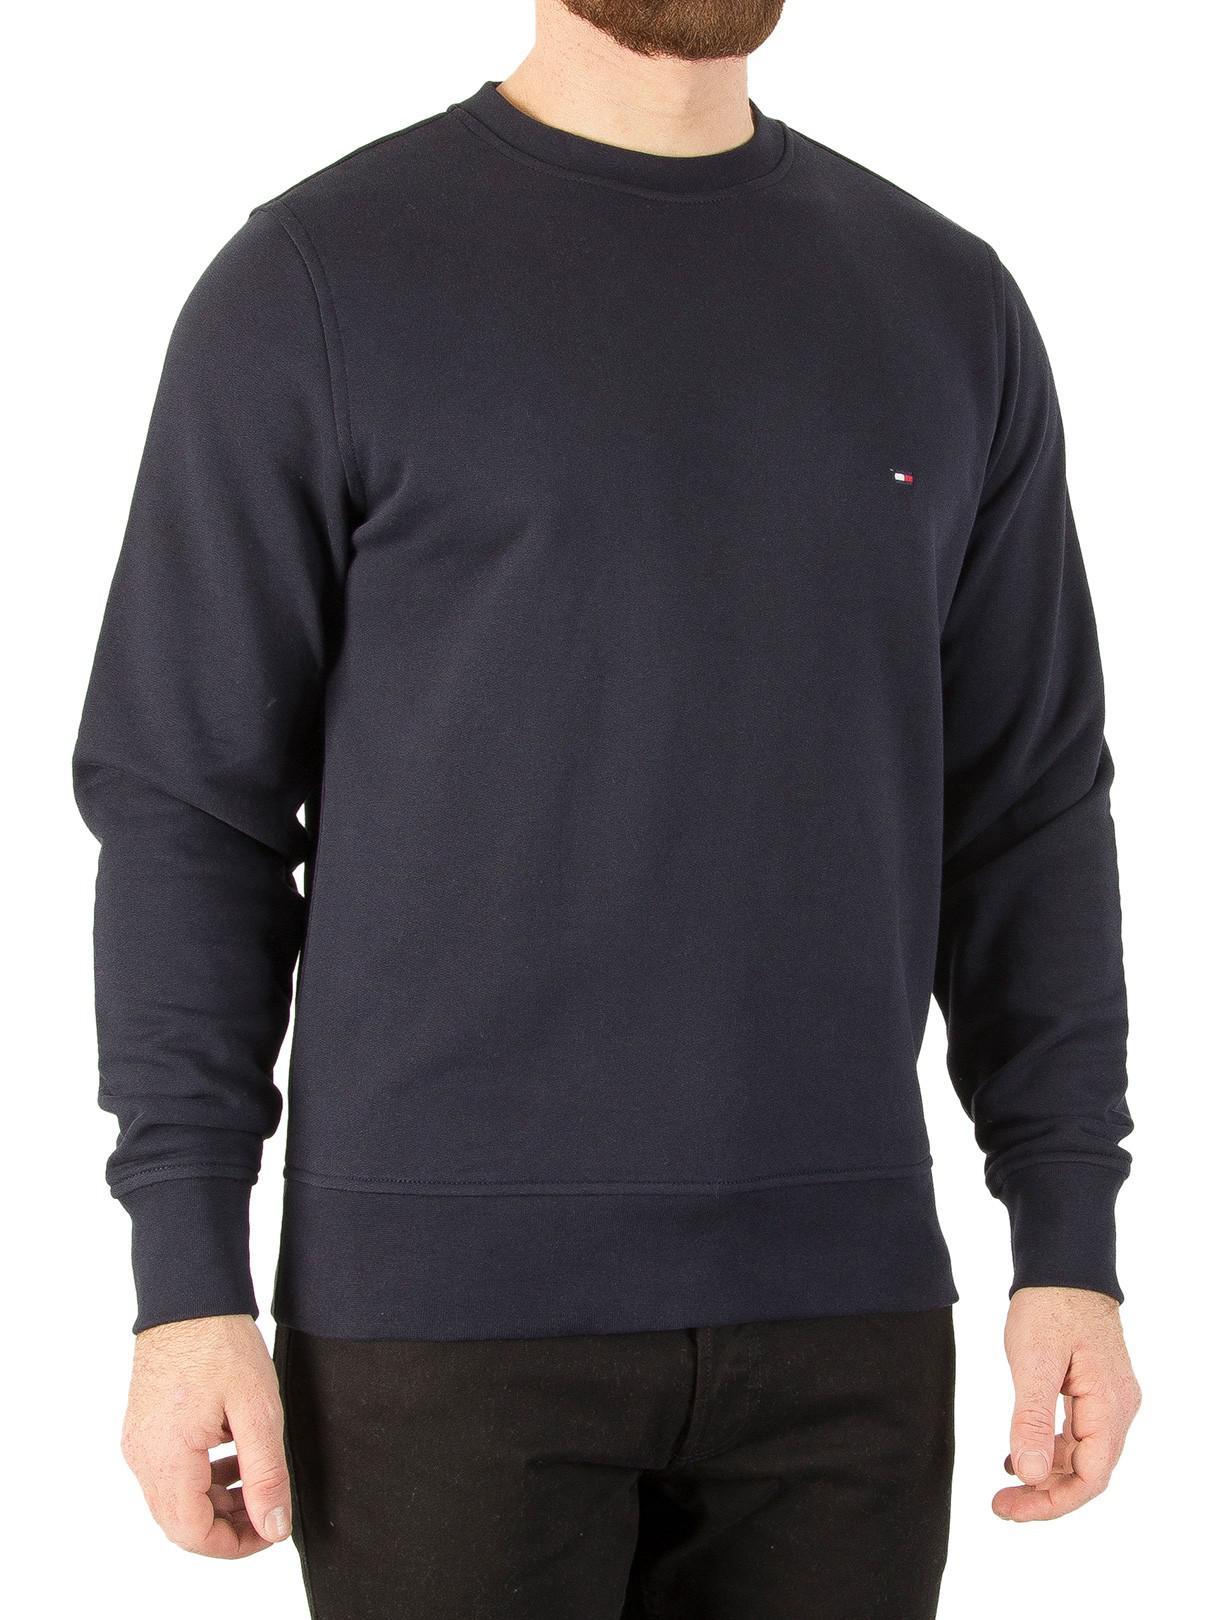 a506c5ff6 Tommy Hilfiger Sky Captain Core Sweatshirt in Blue for Men - Lyst